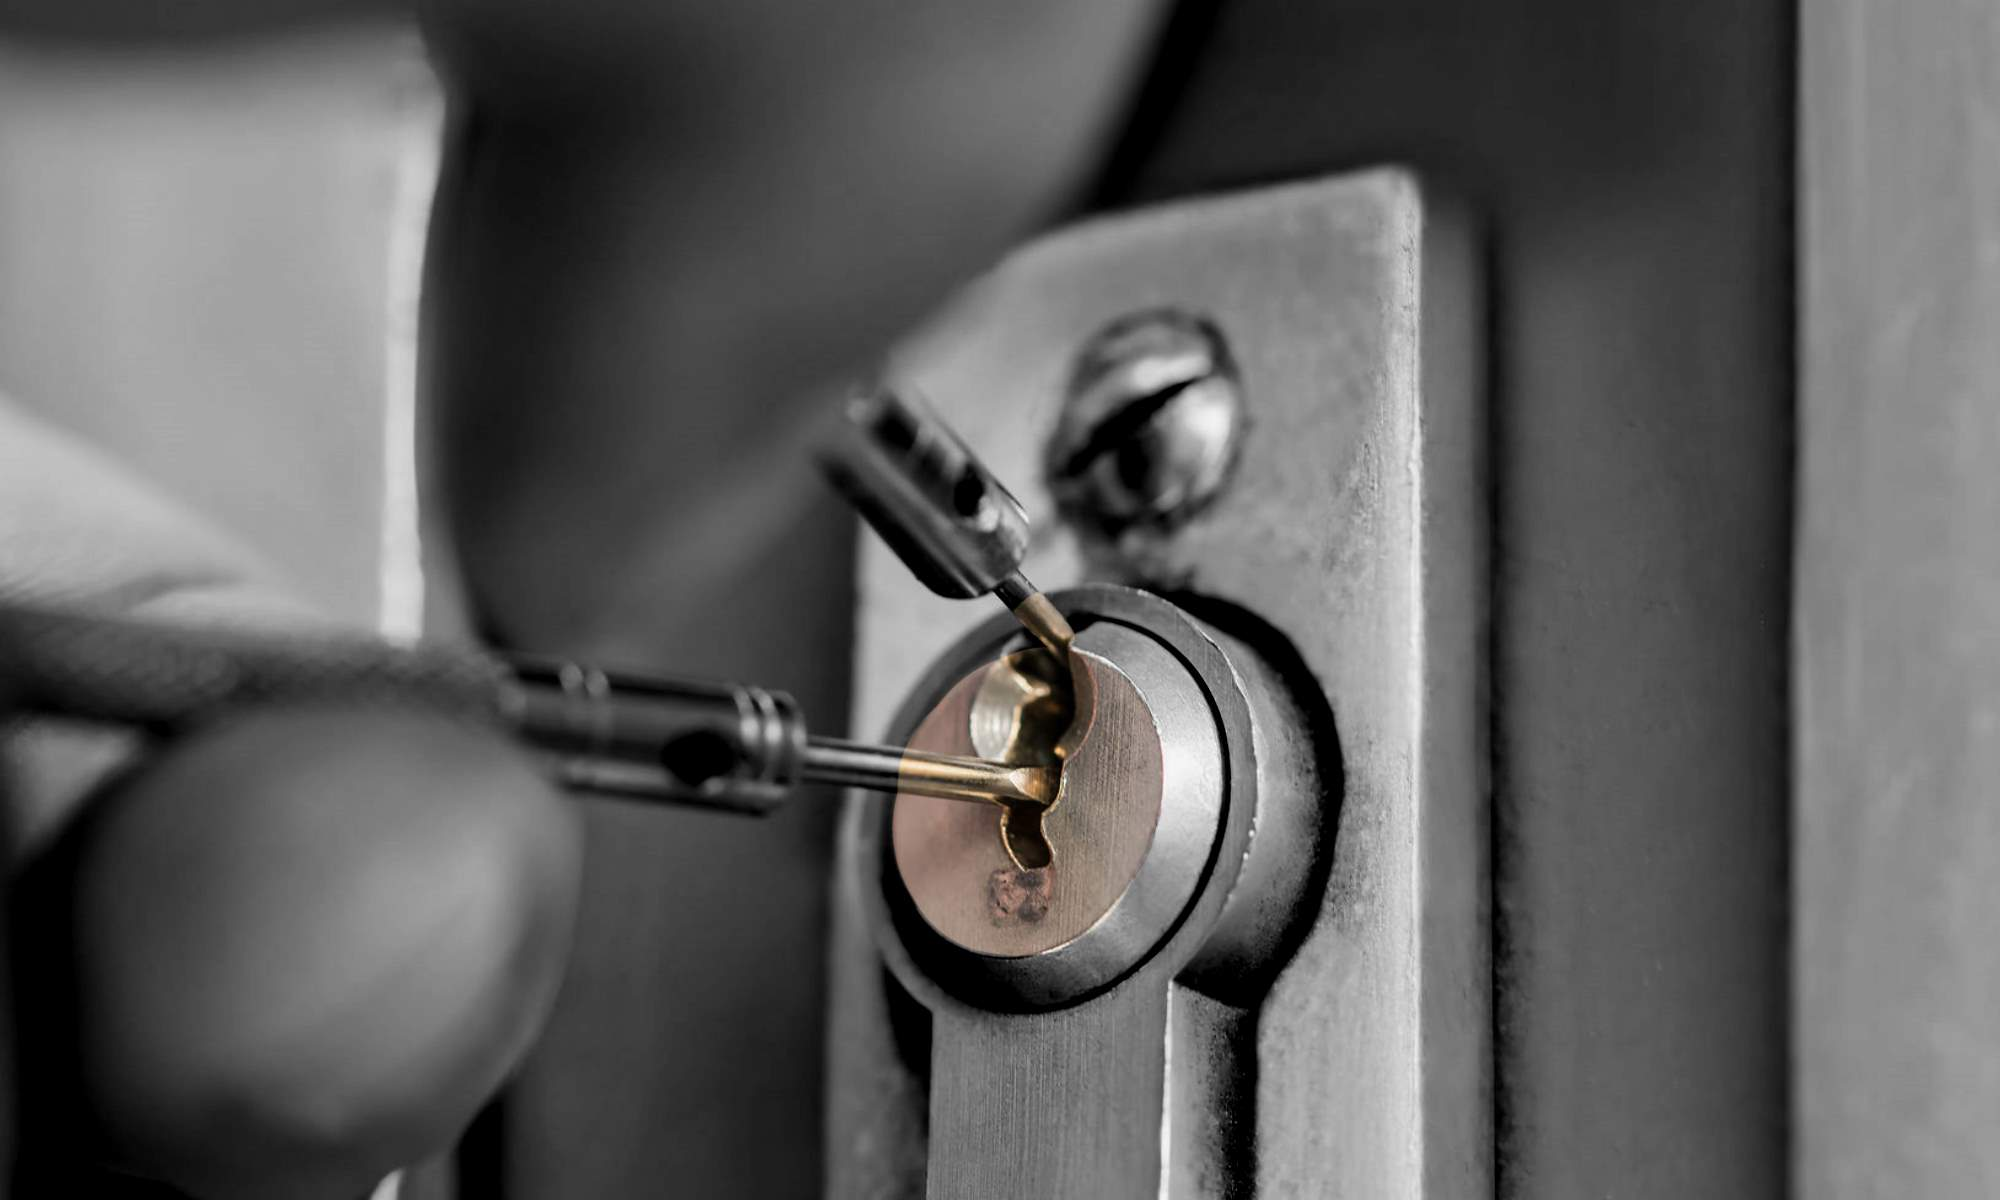 Emergency locksmith services near me